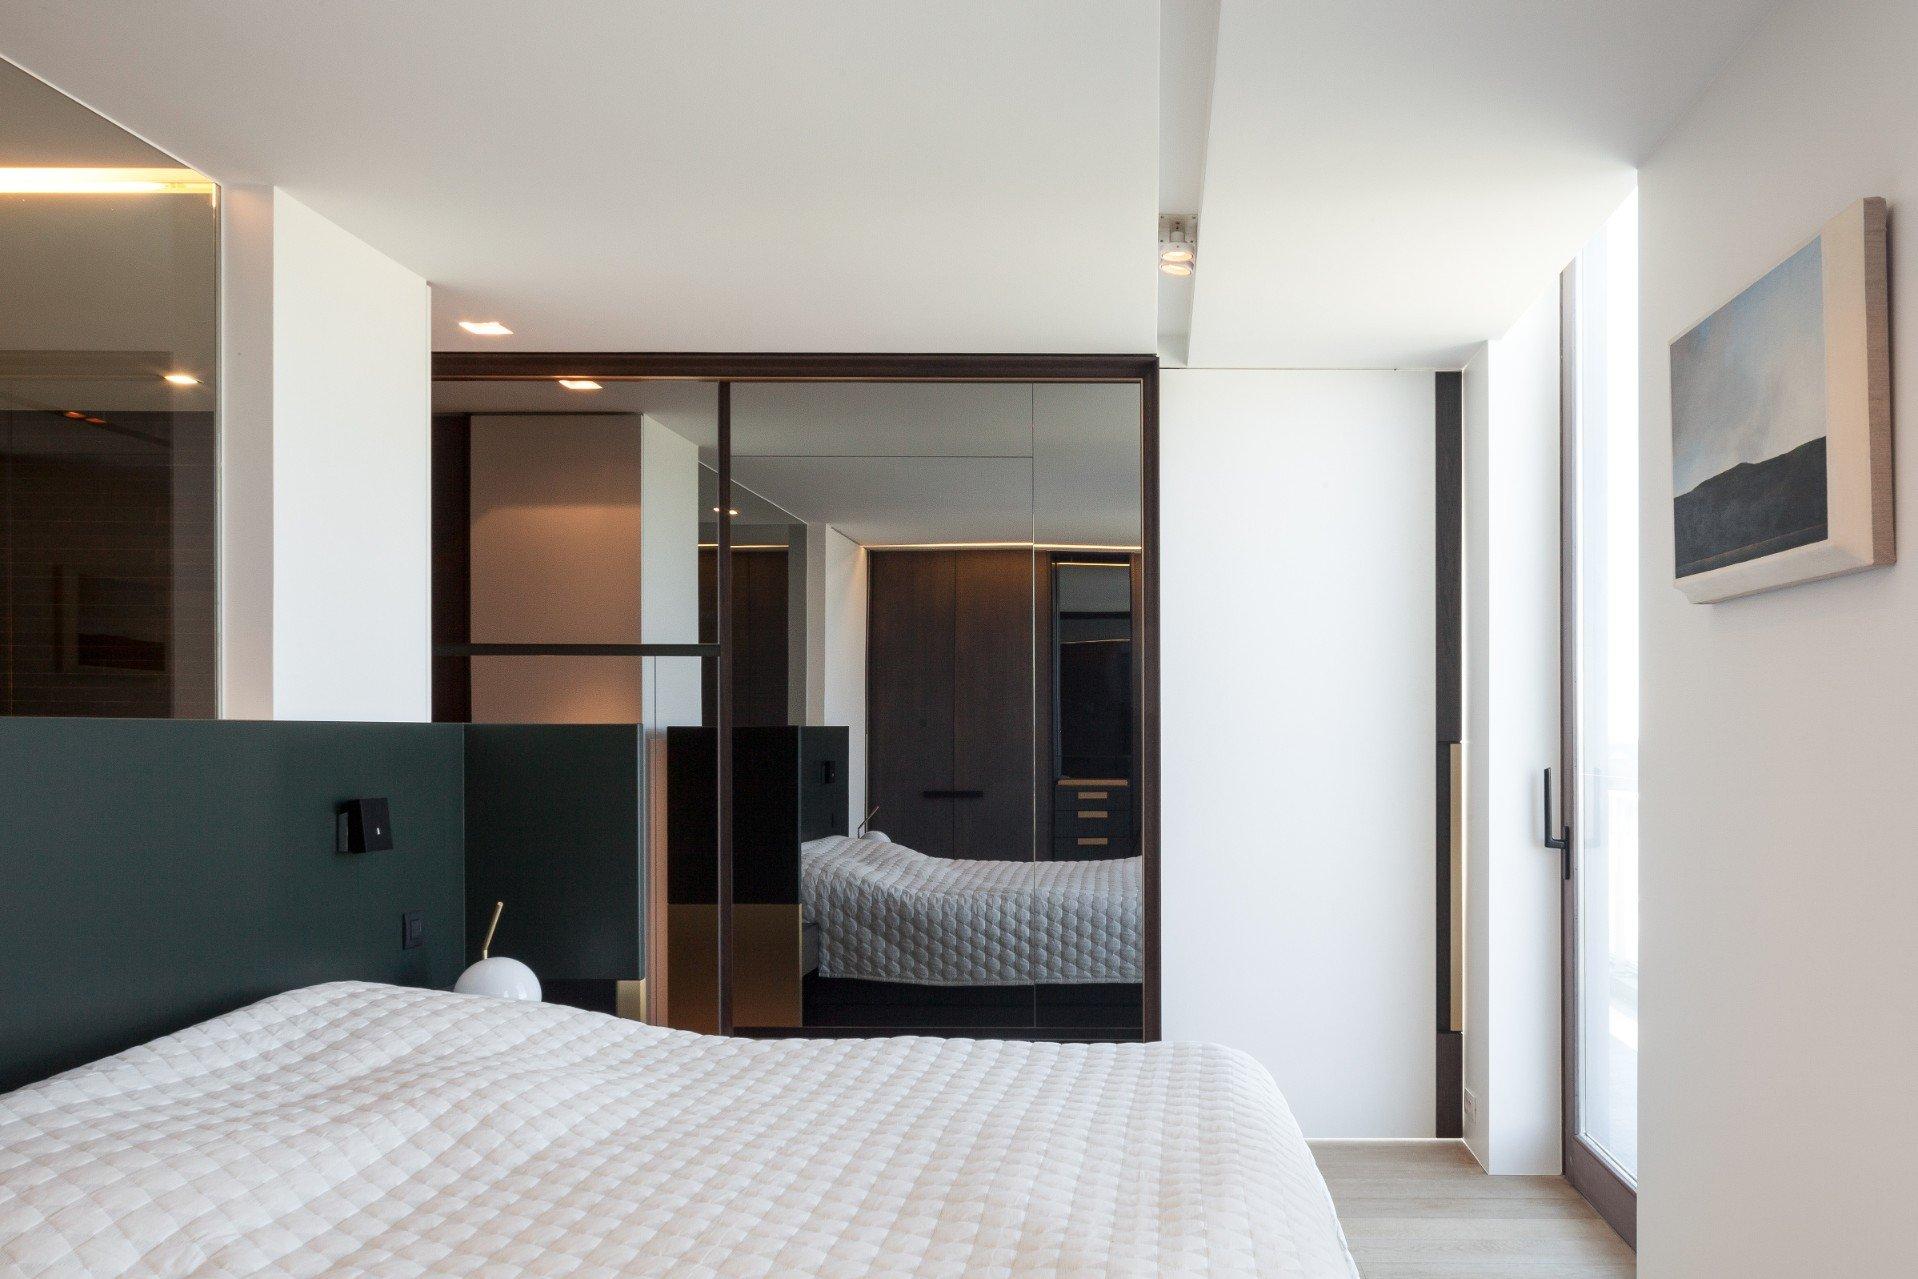 Rietveldprojects-penthouse-appartement-design-architectuur-kust12